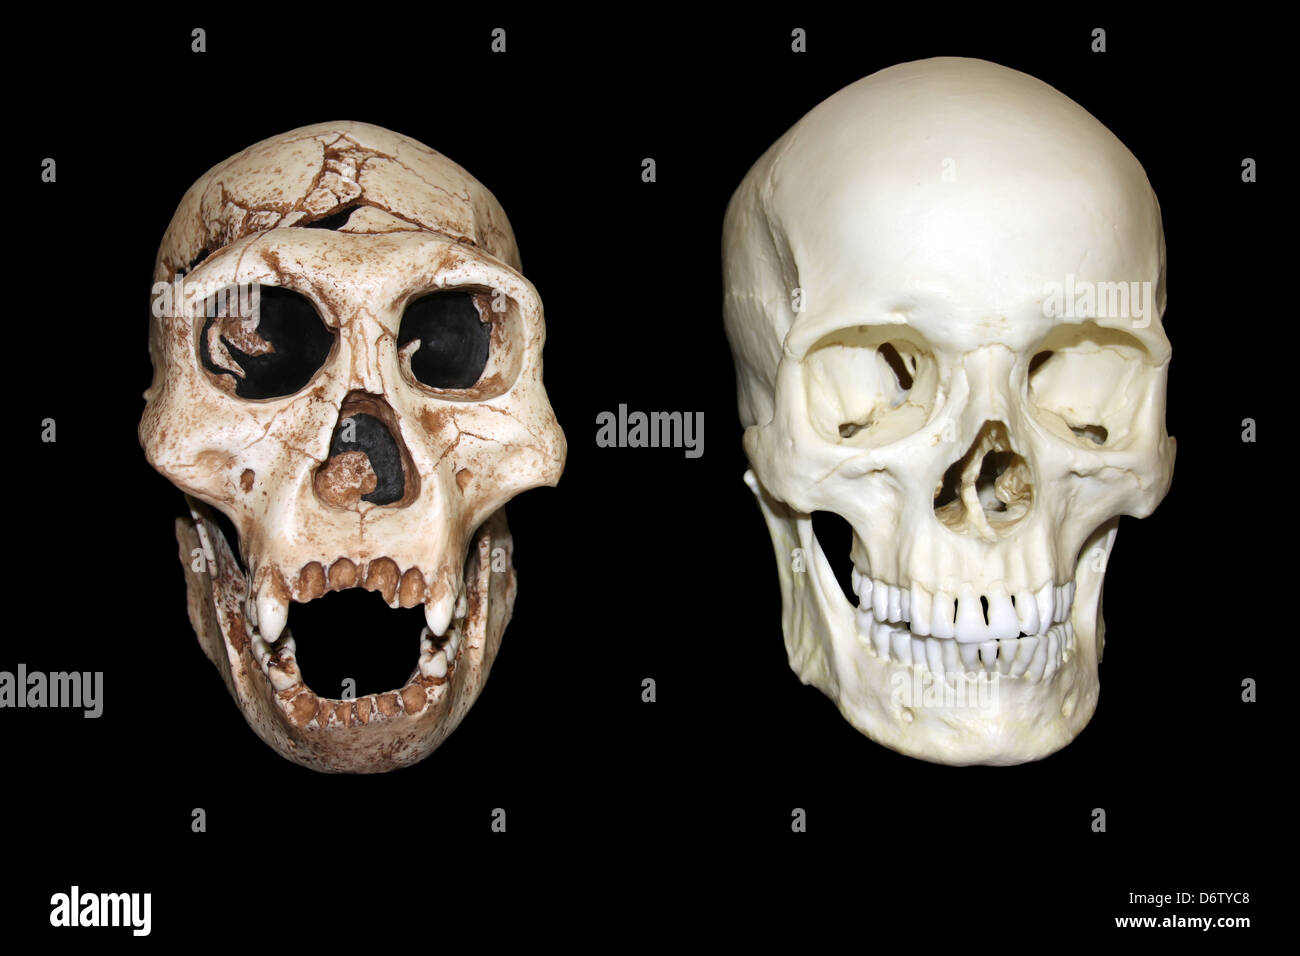 Dmanisi Homo erectus vs Homo sapiens Skull Stock Photo